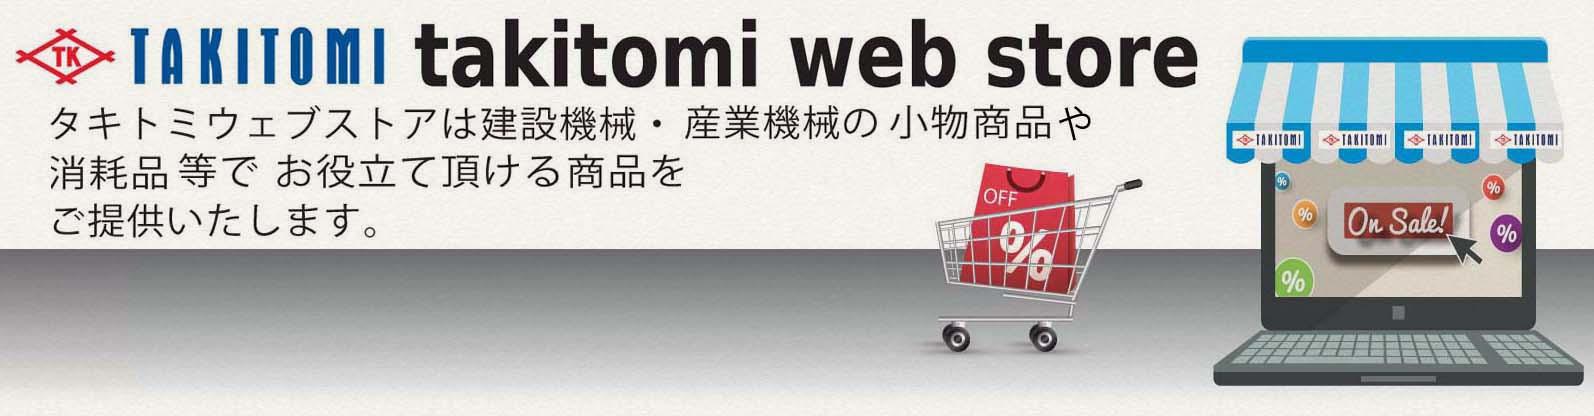 takitomi web store